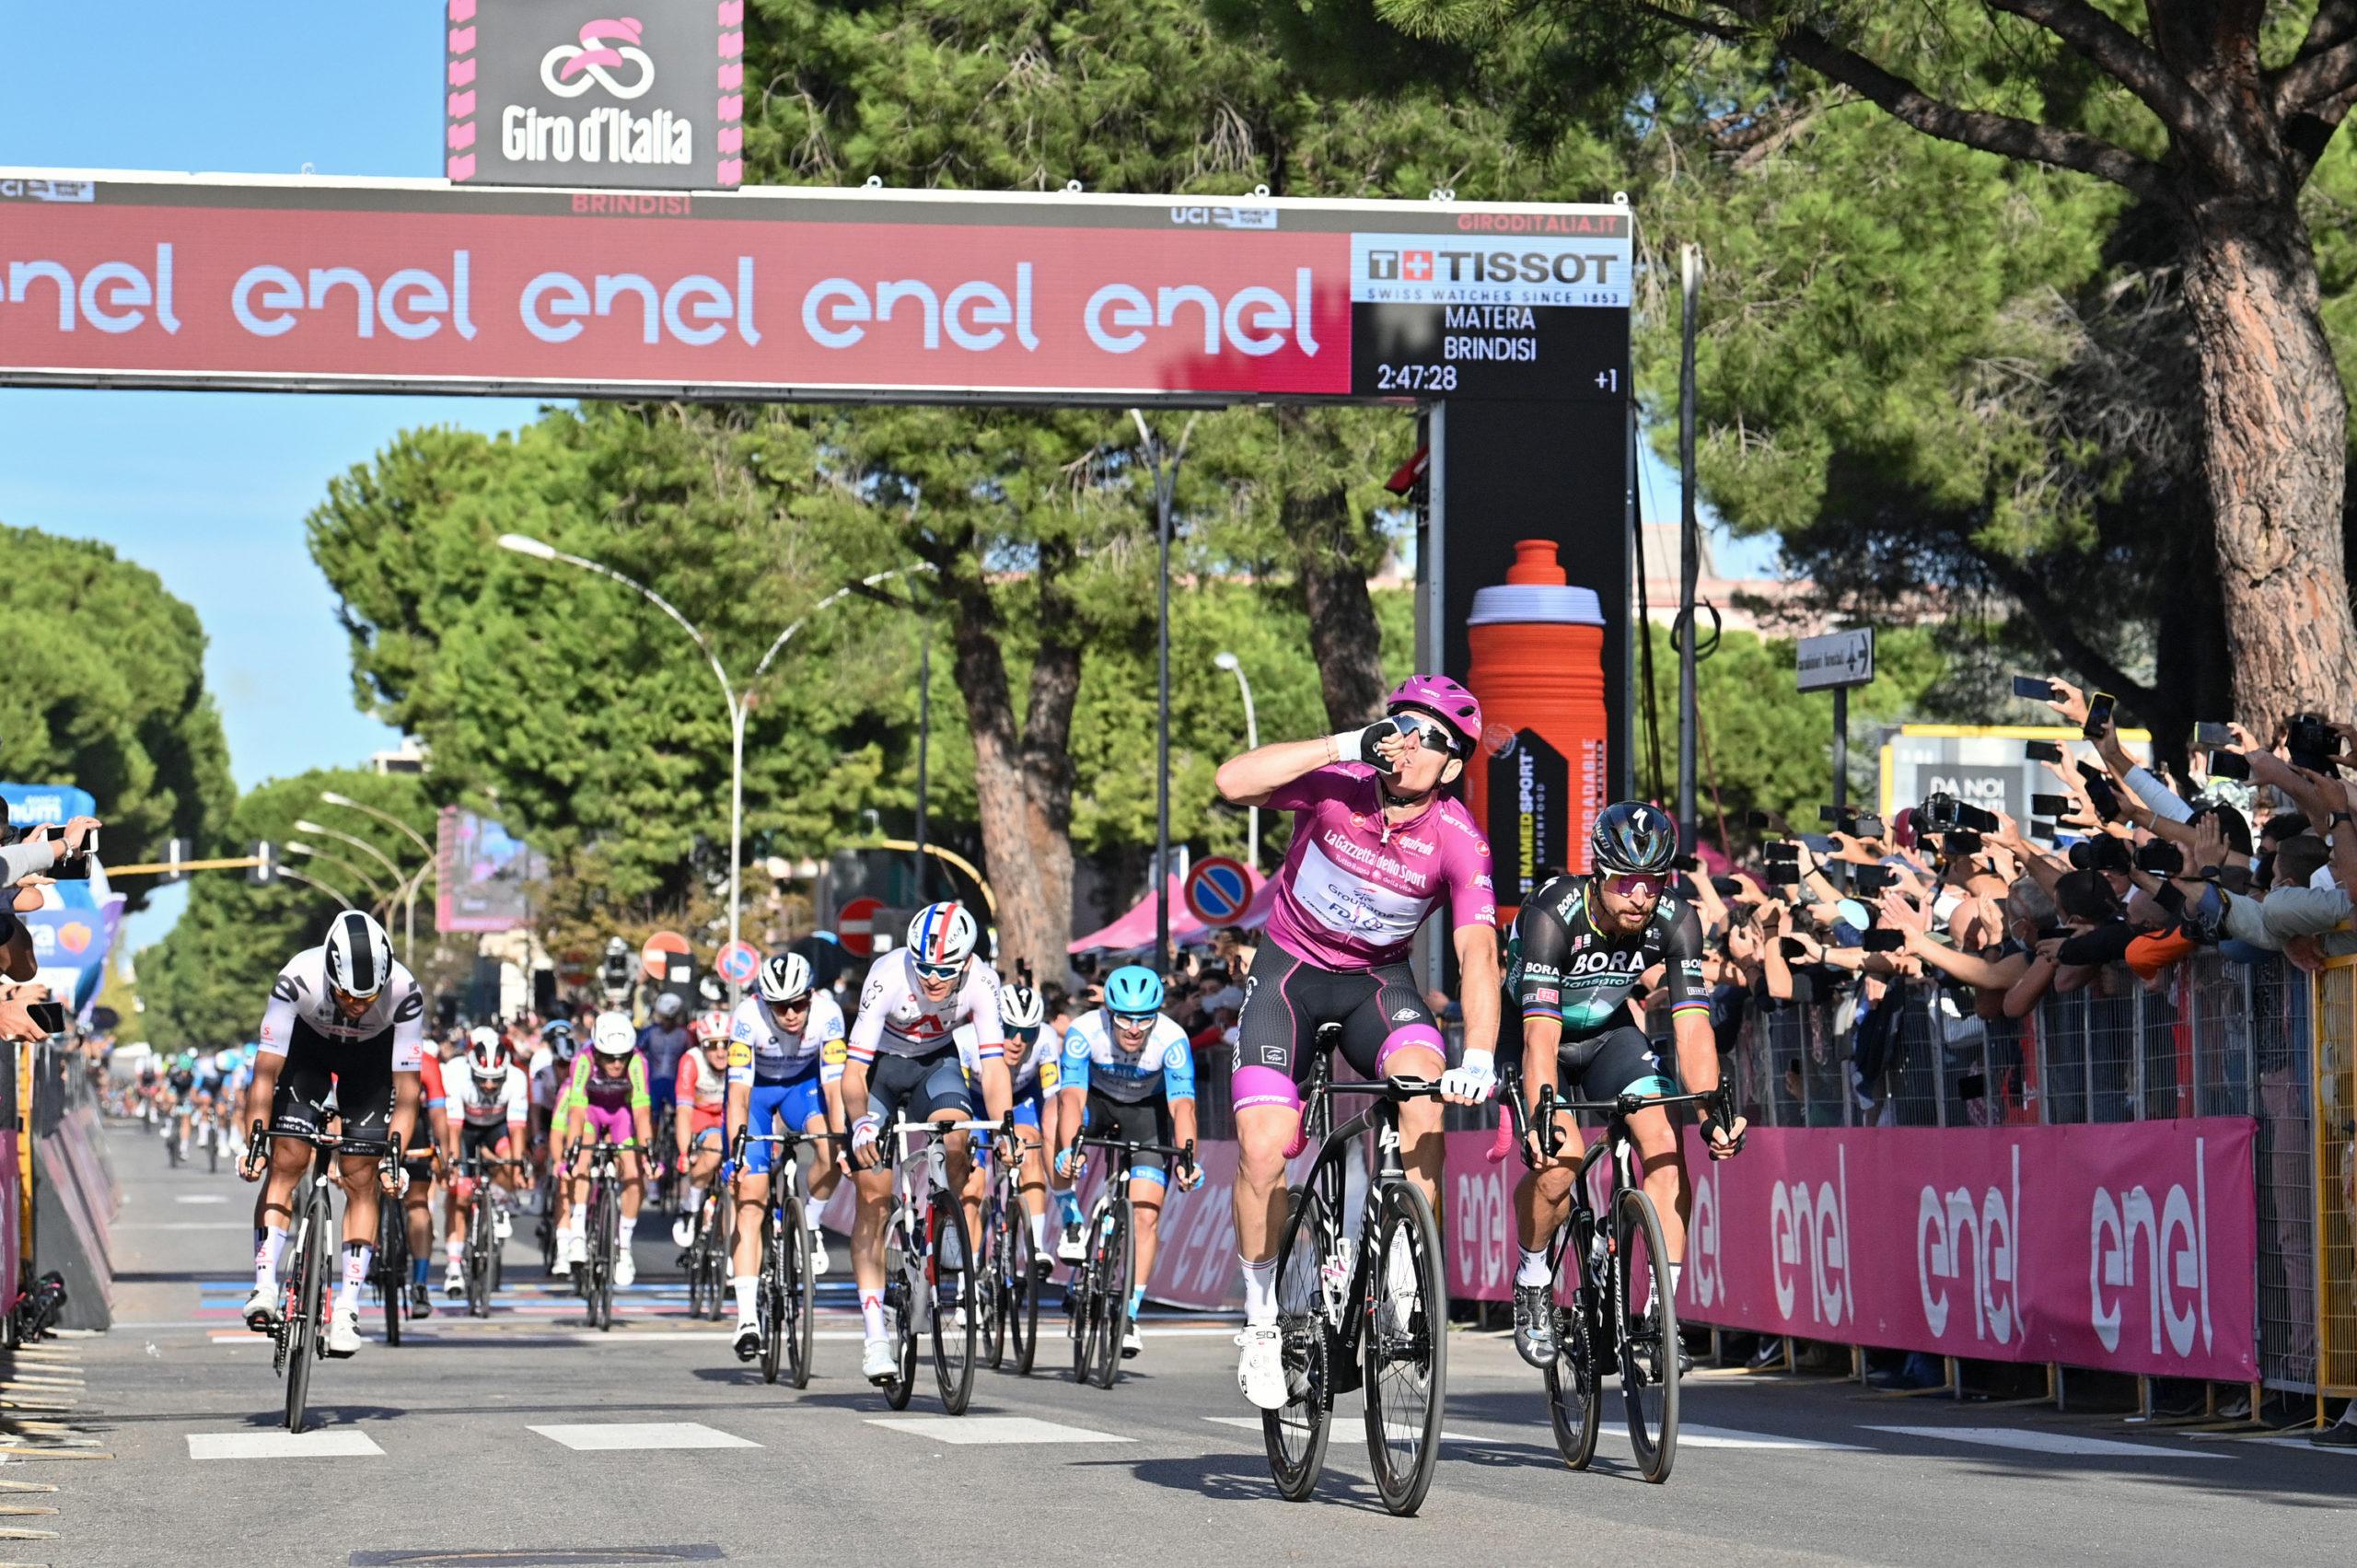 51.234 km/t. Démare vandt den hurtigste etape i Giro'en nogensinde